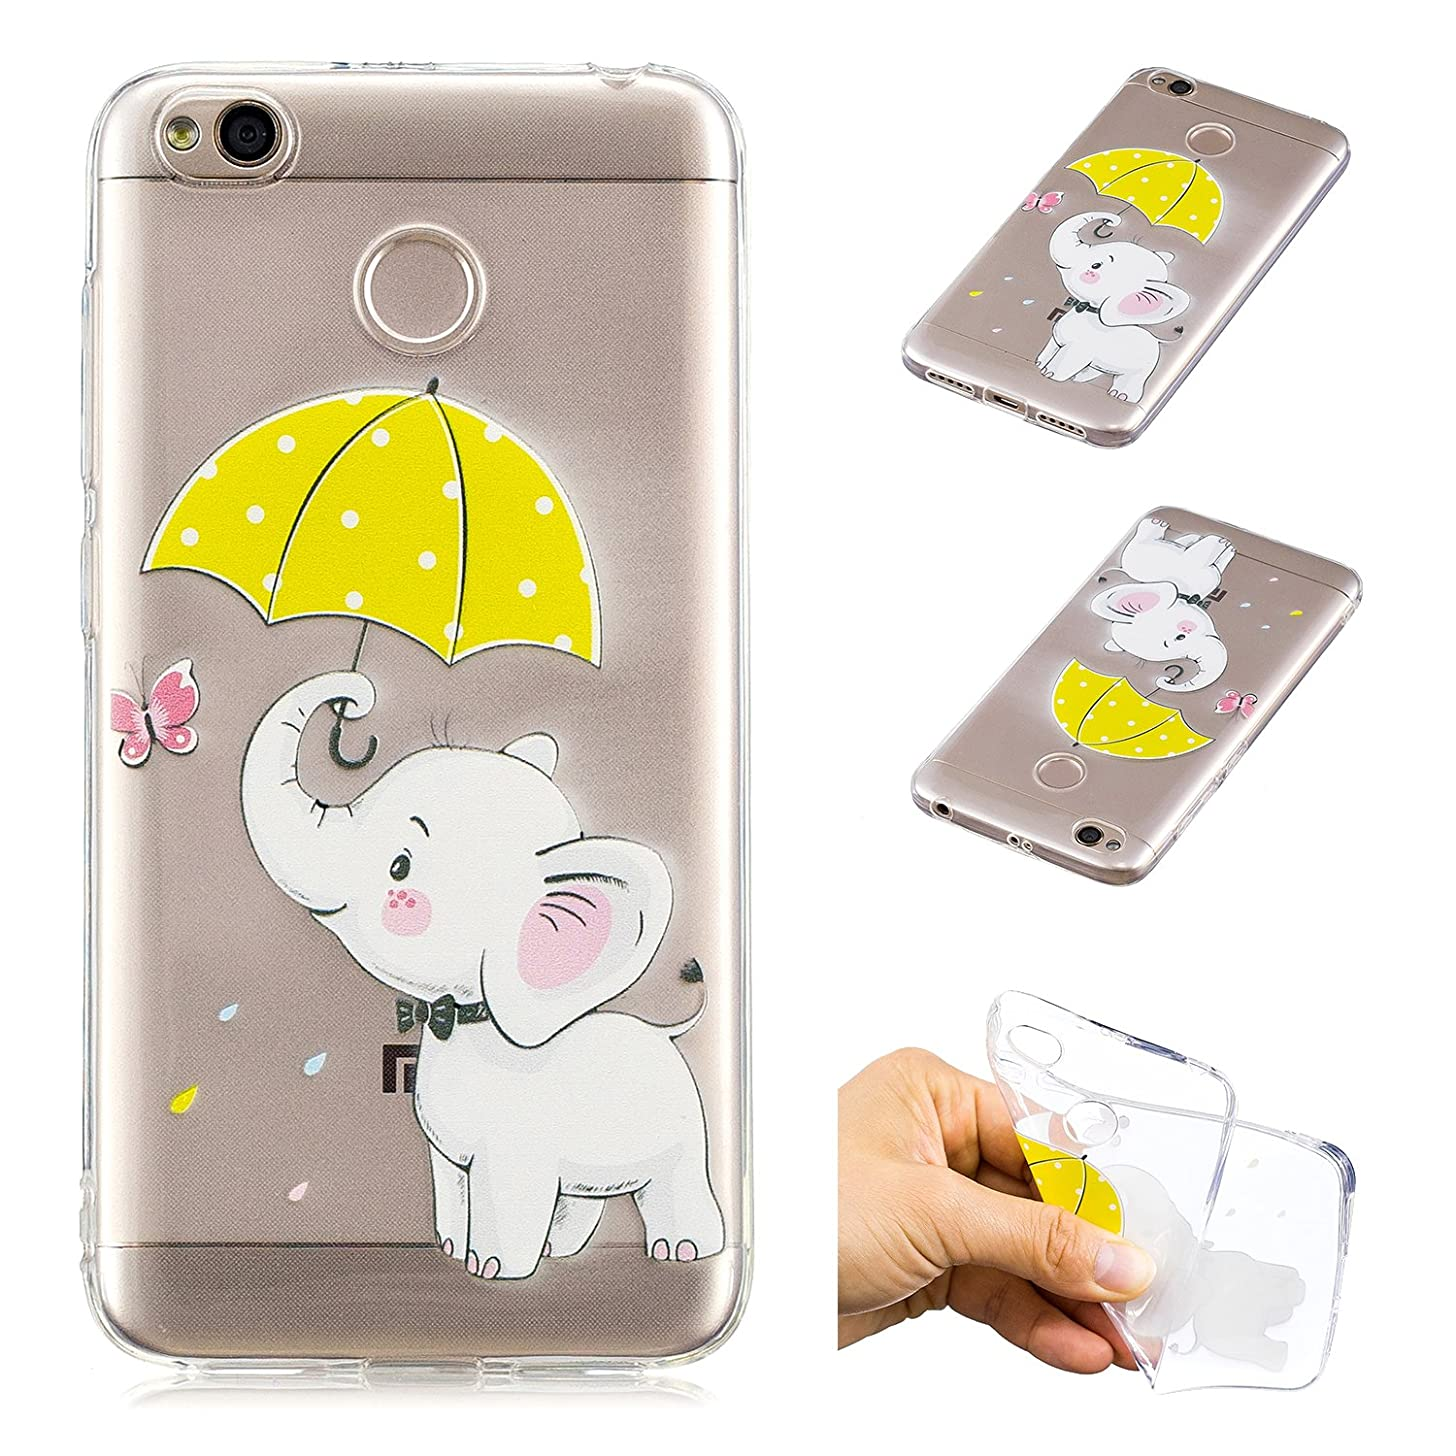 Creative Case for Xiaomi Redmi Note 5A,Transparent Soft Clear TPU Cover for Xiaomi Redmi Note 5A,Leecase Umbrella Elephant Cute Pattern Flexible Protective Case Cover for Xiaomi Redmi Note 5A